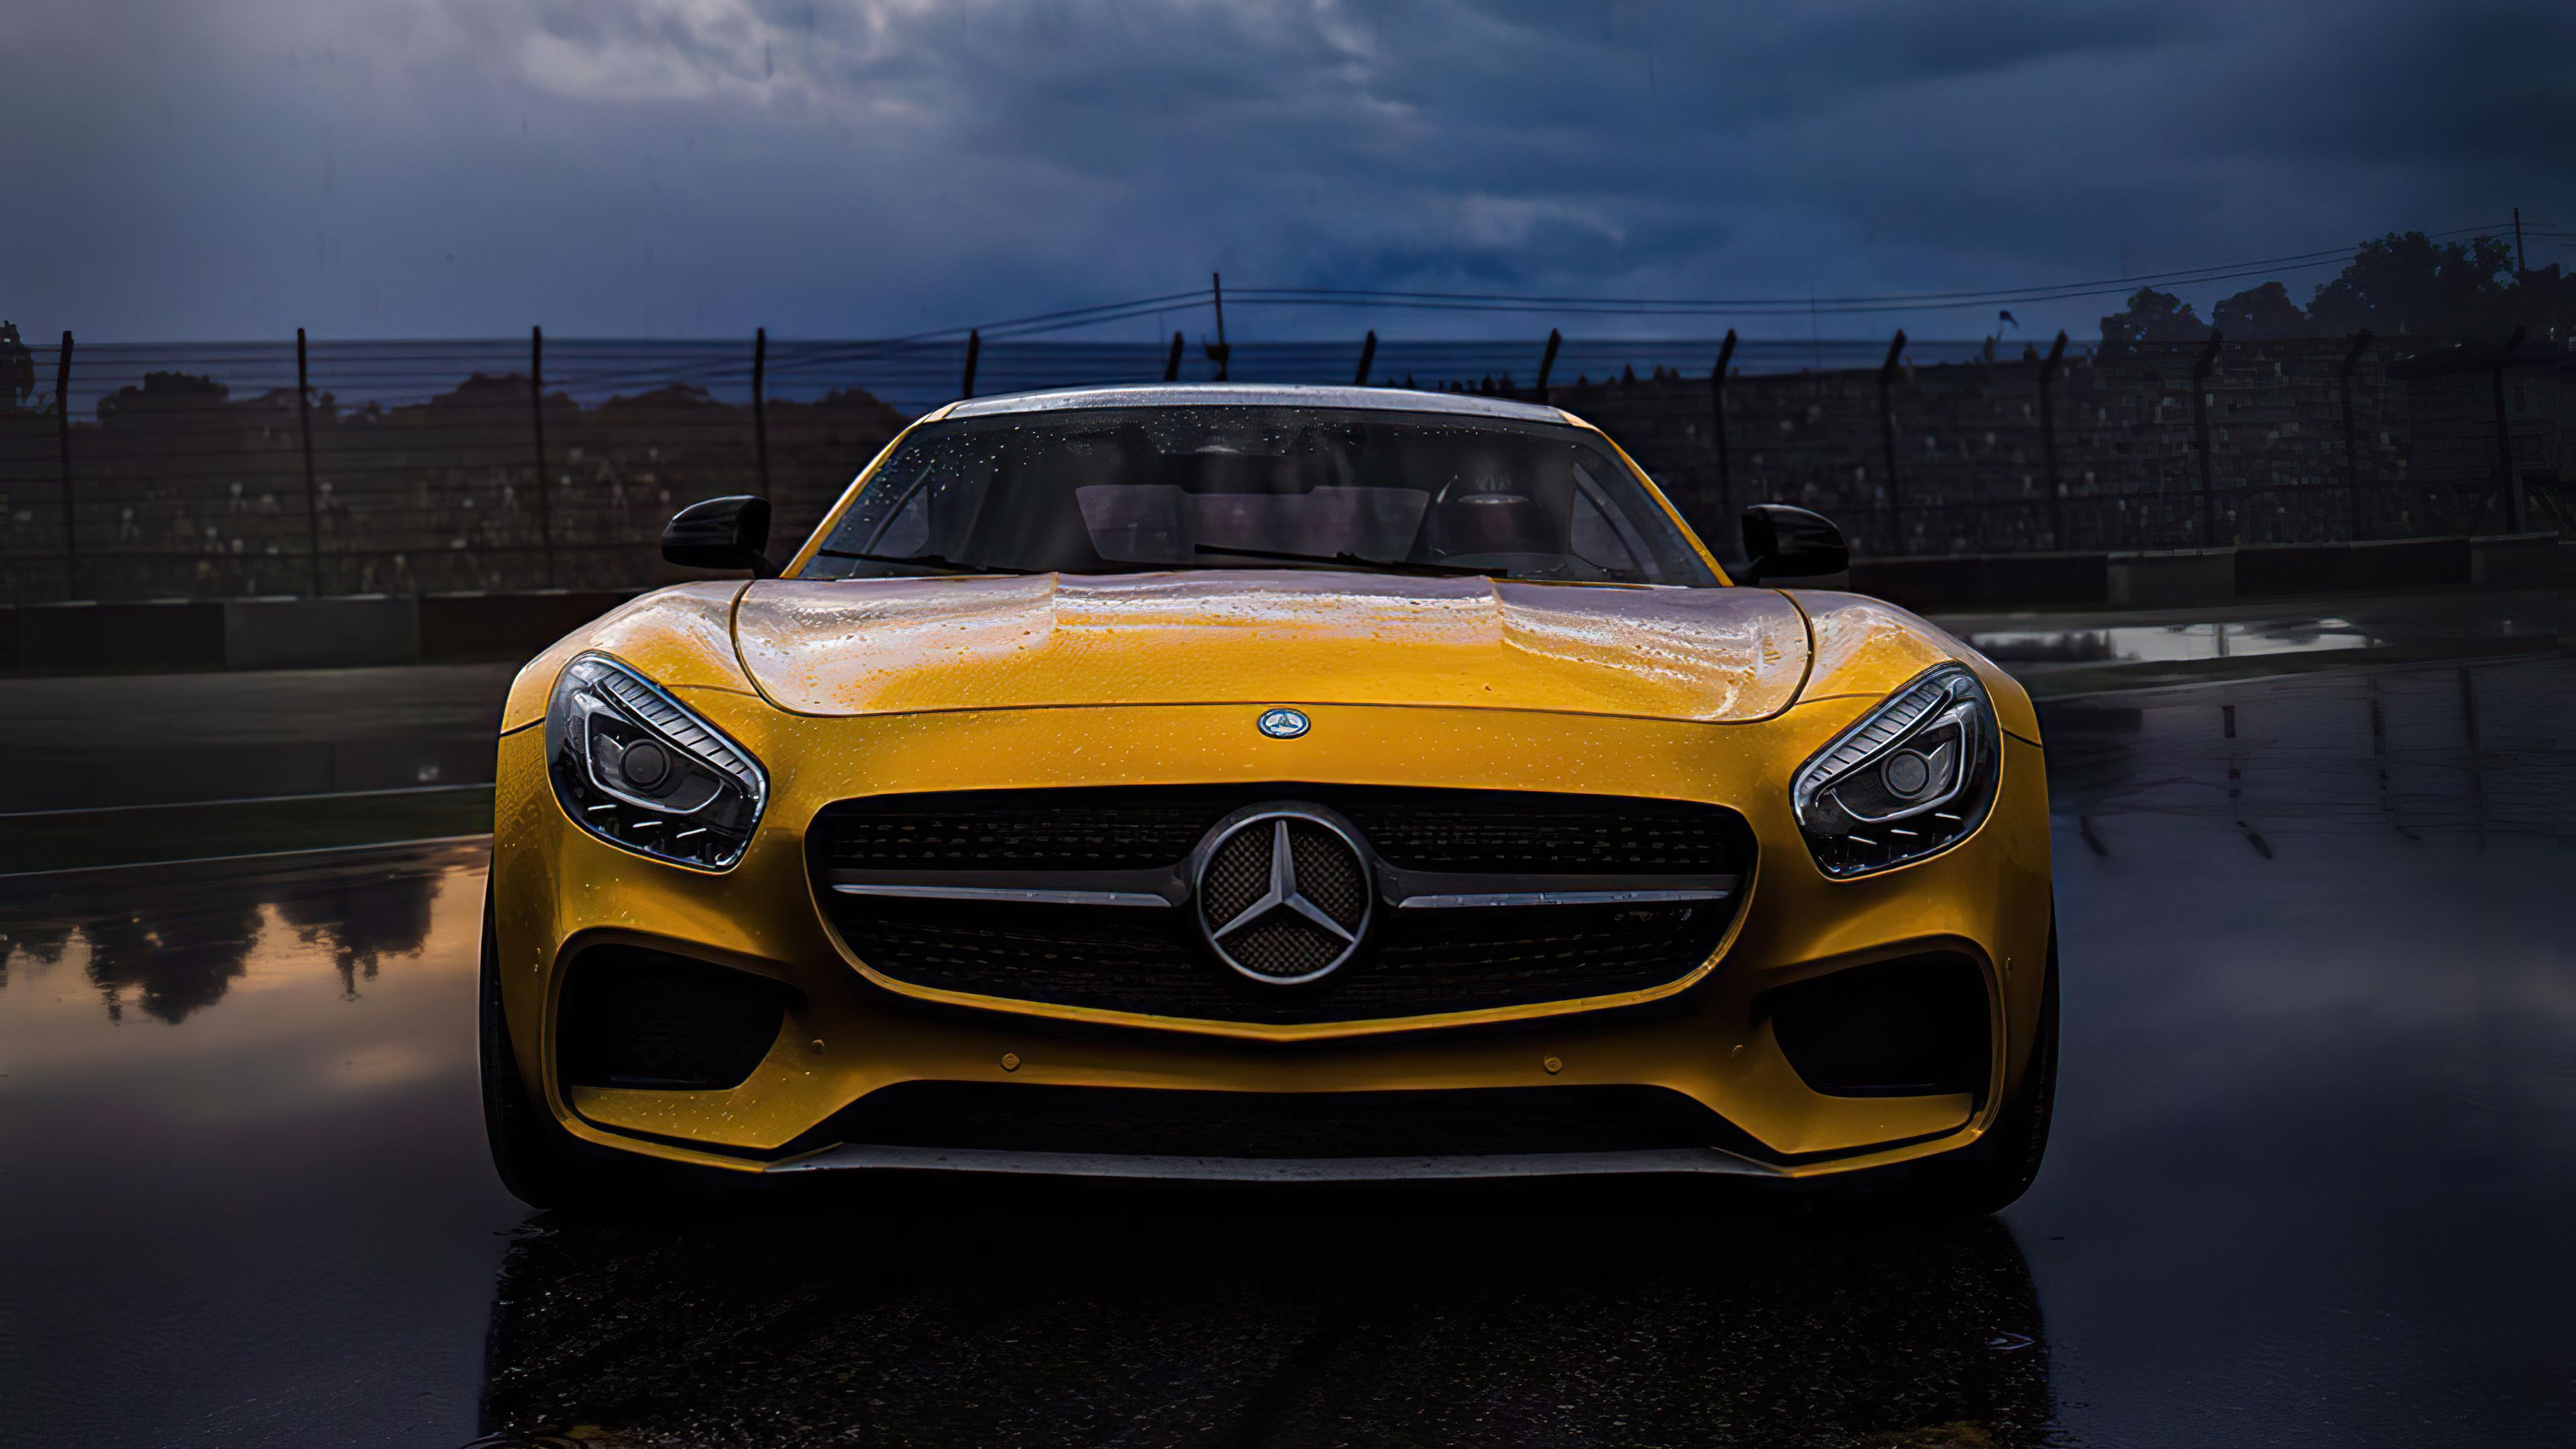 Yellow Mercedes Benz Amg 2020 4k Yellow Mercedes Benz Amg 2020 4k Wallpapers In 2021 Mercedes Benz Amg Benz Mercedes Benz